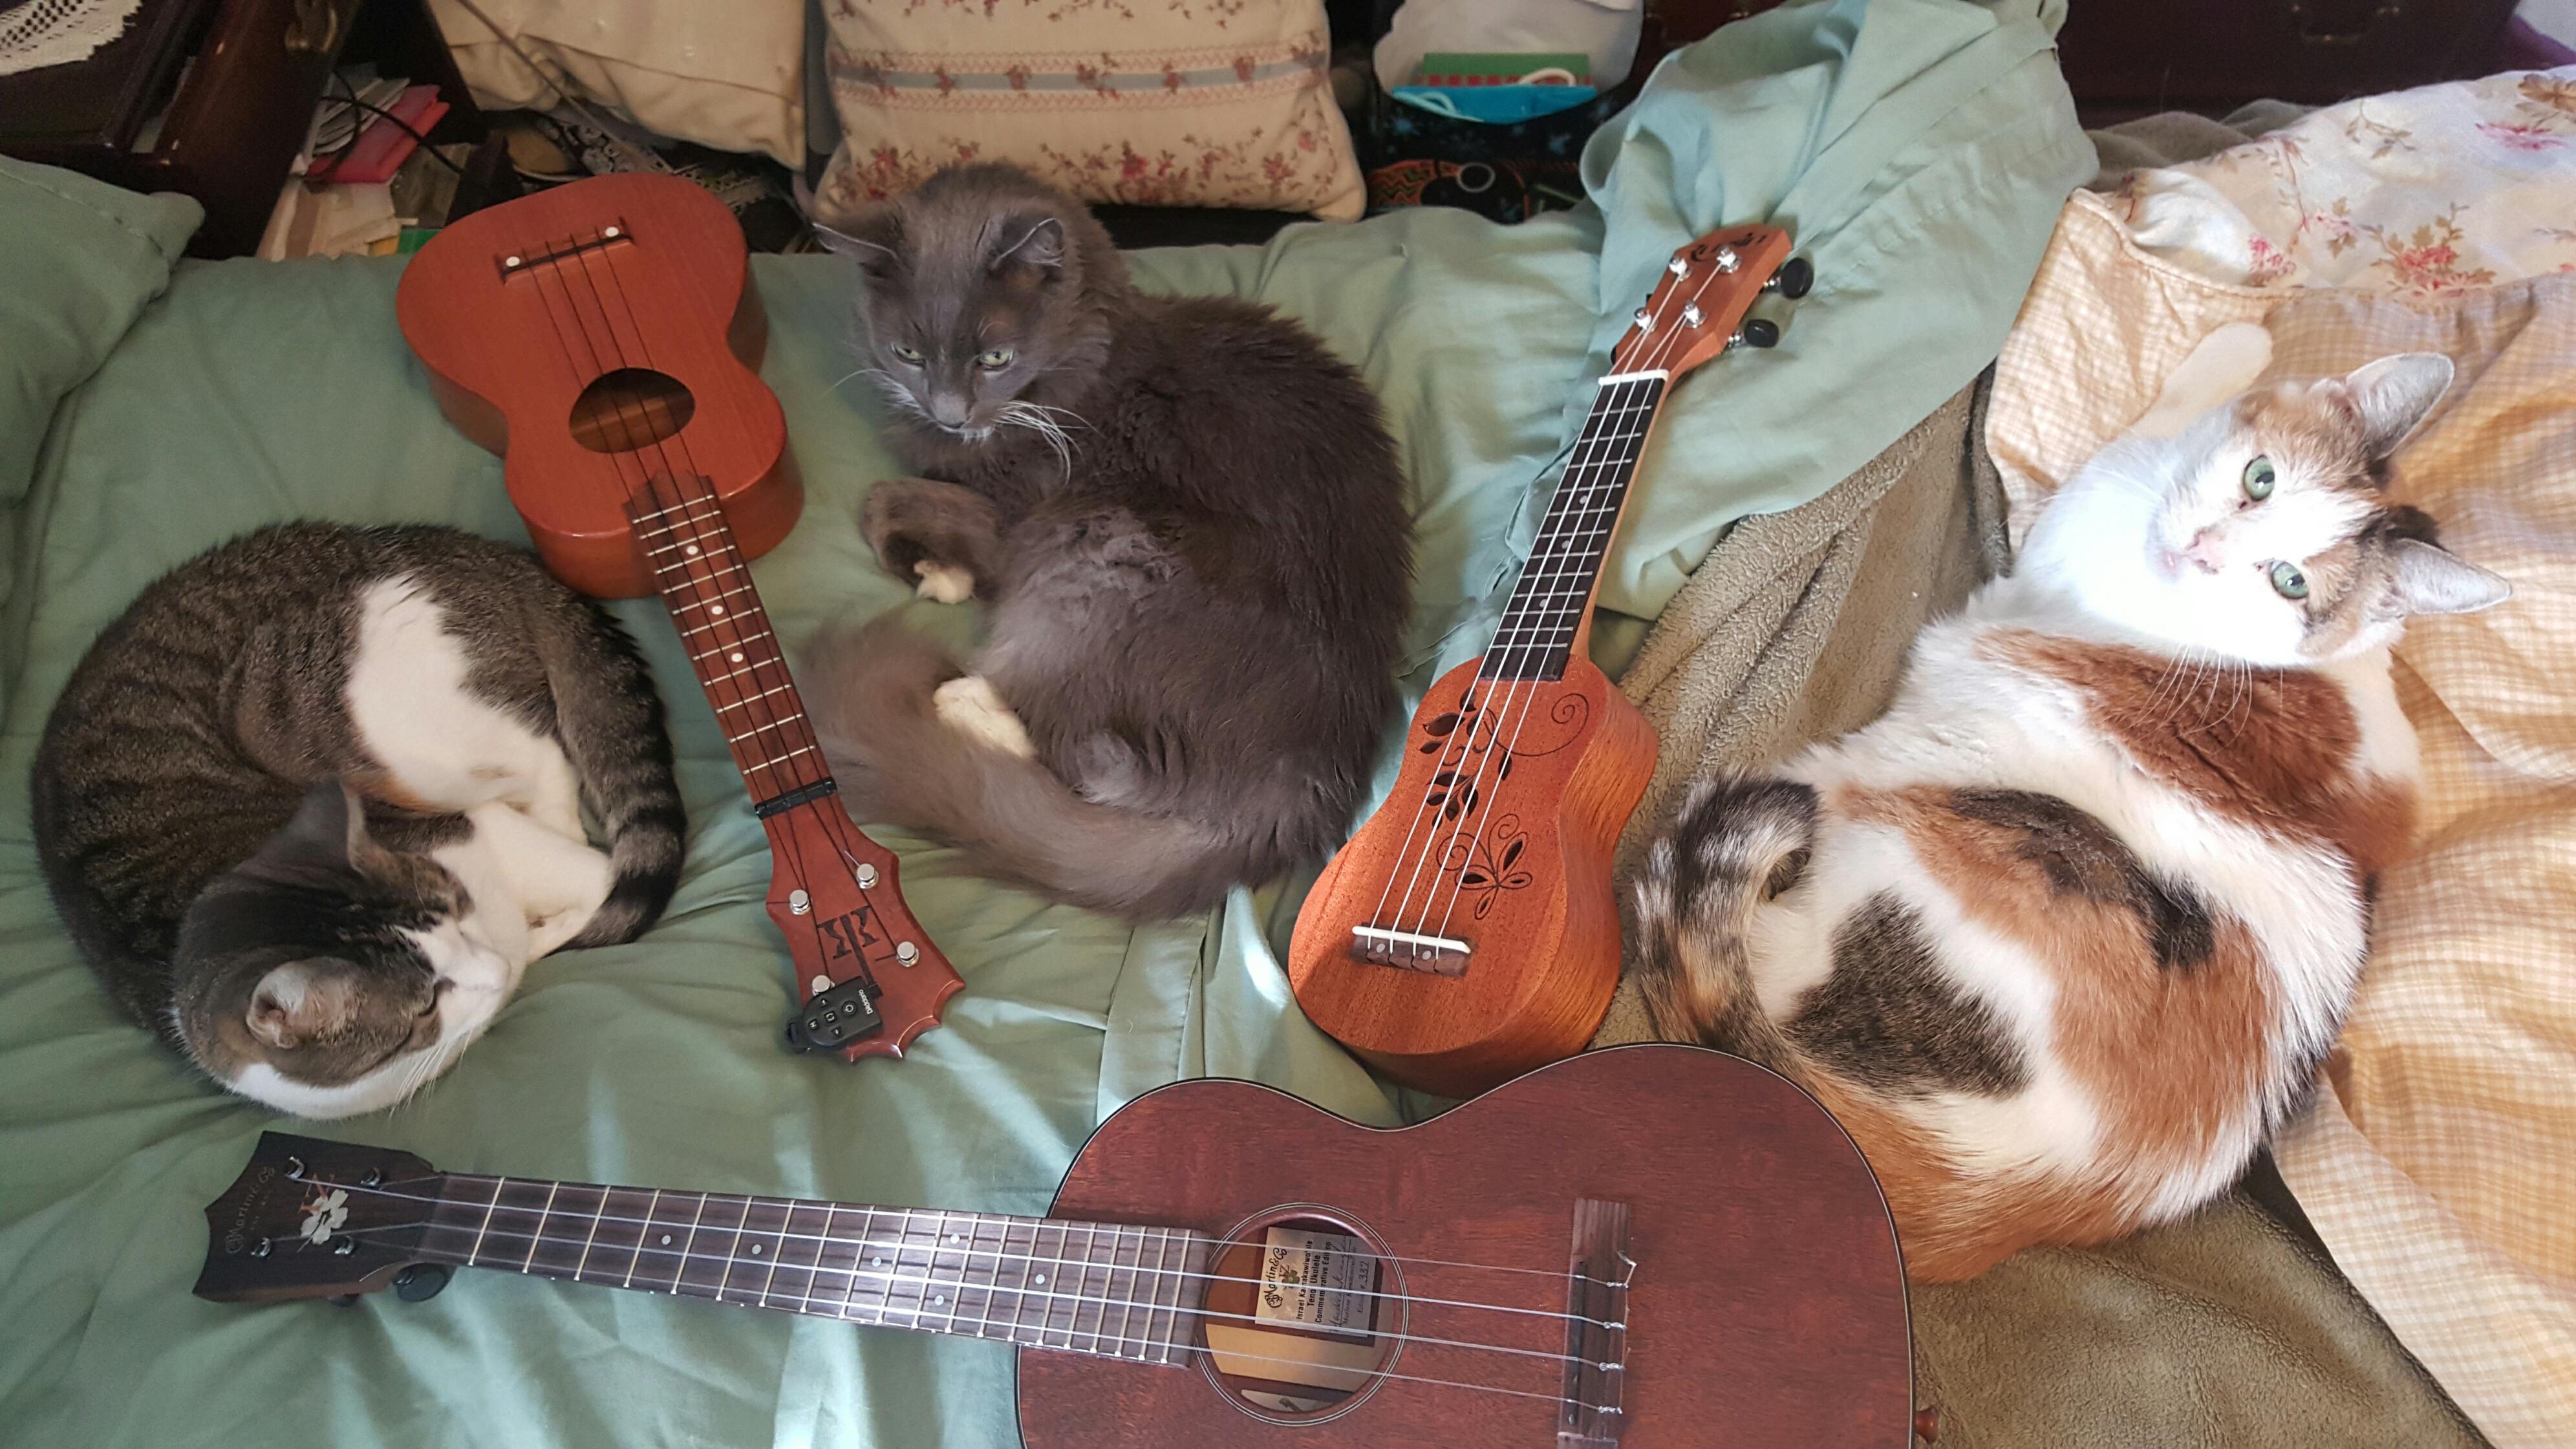 Cathy Frahme.One can never have too many ukes or cats. Well, ukes anyway. Muzby, Angel and Marshmallow with my Koaloha soprano,  Rubin pocket uke and my pride and joy,  Martin